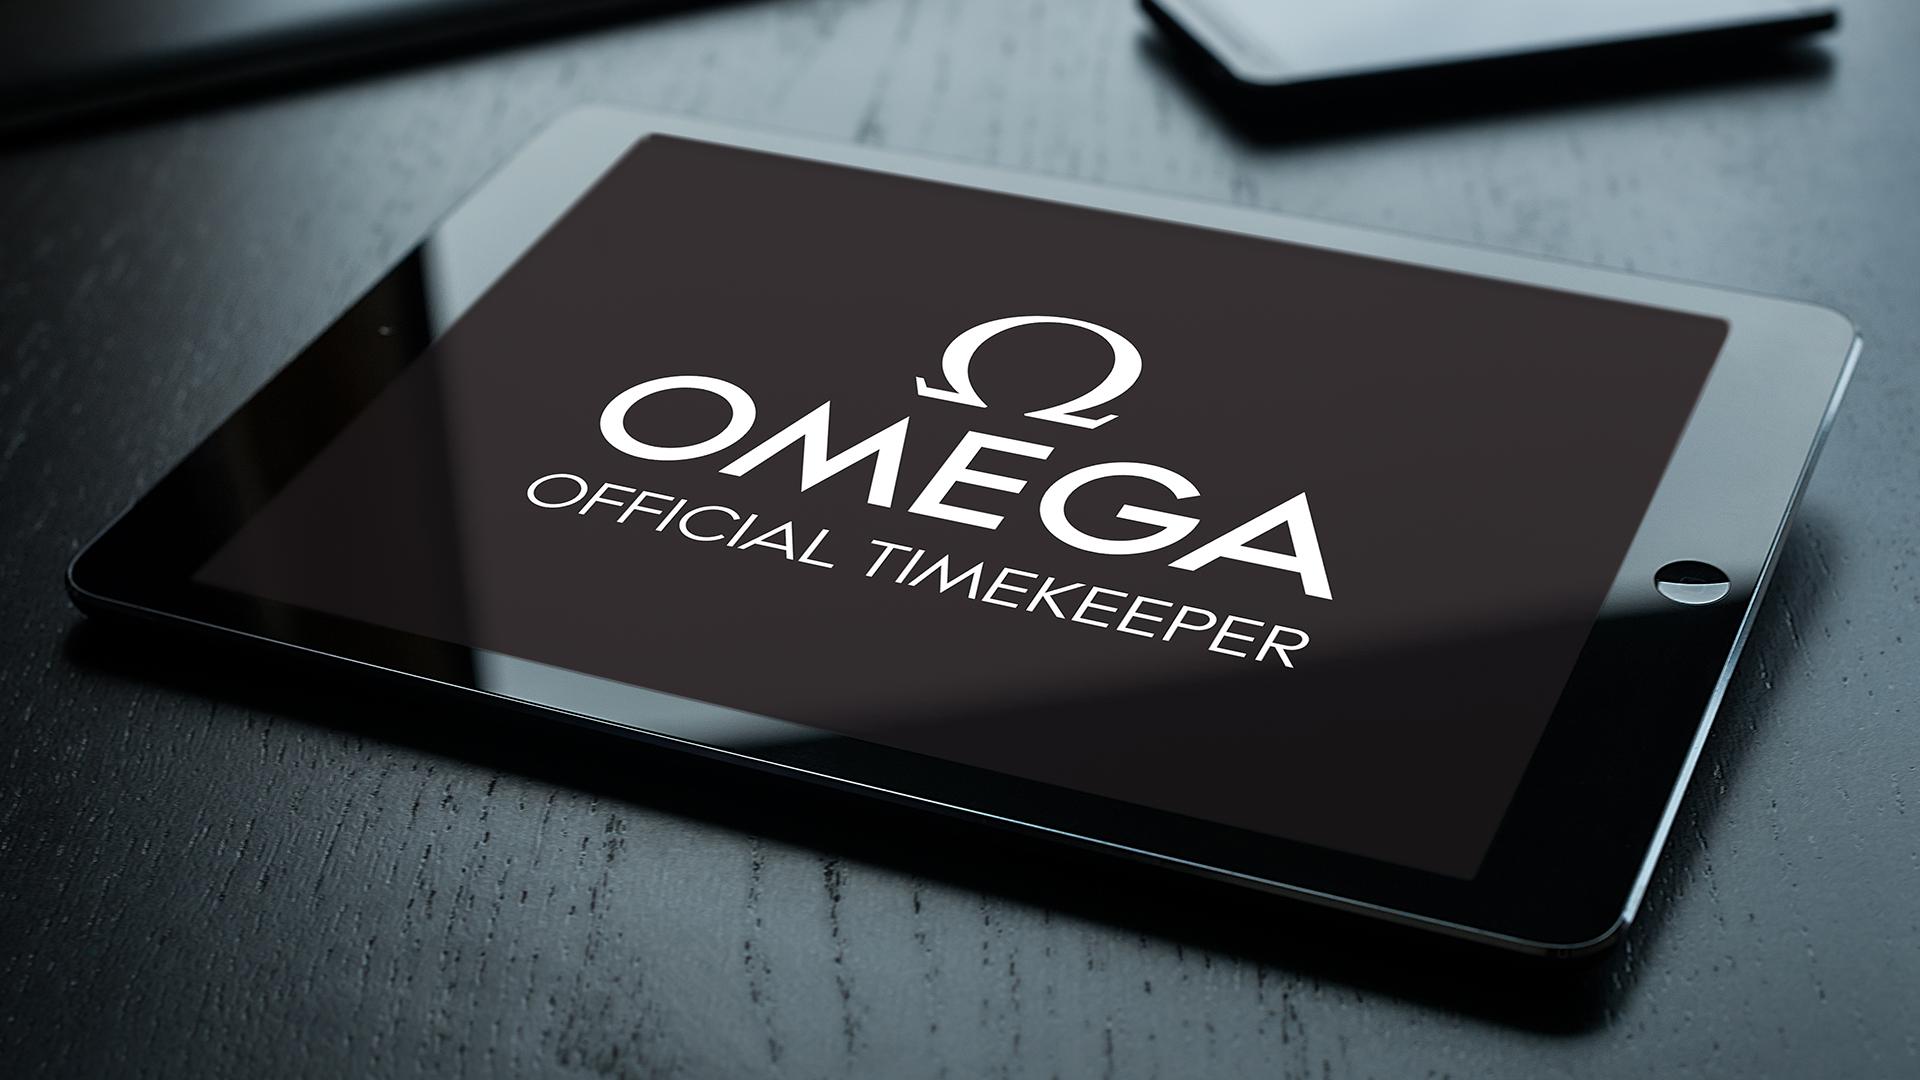 Omega App Design and Development